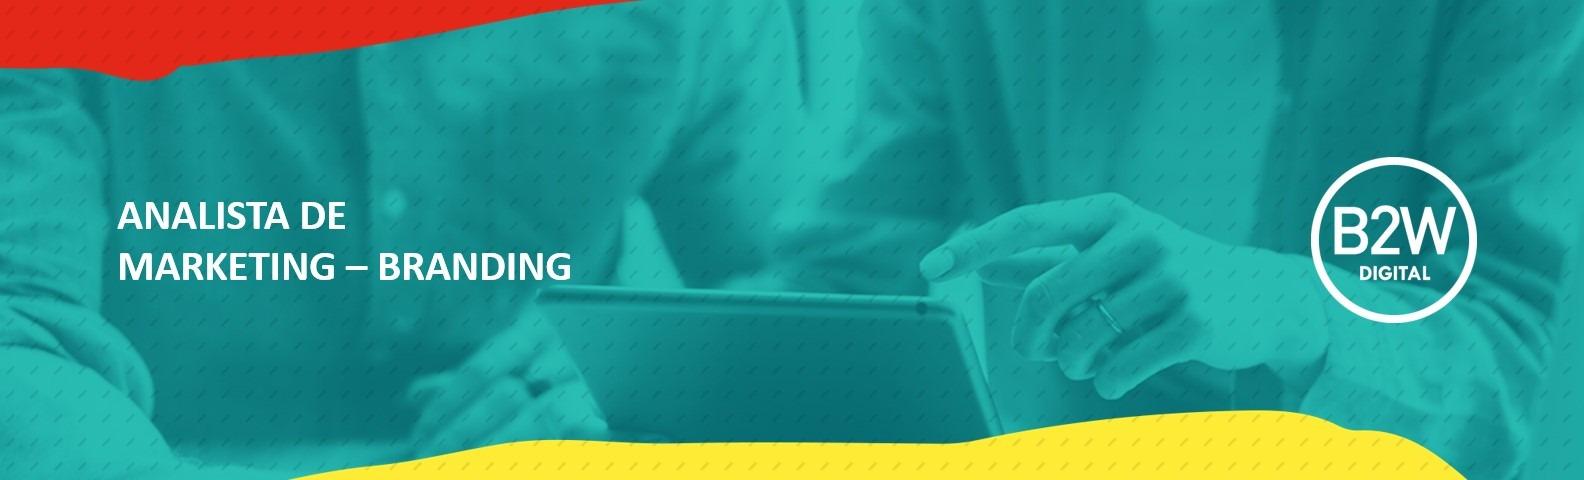 Analista de Marketing SR – Branding